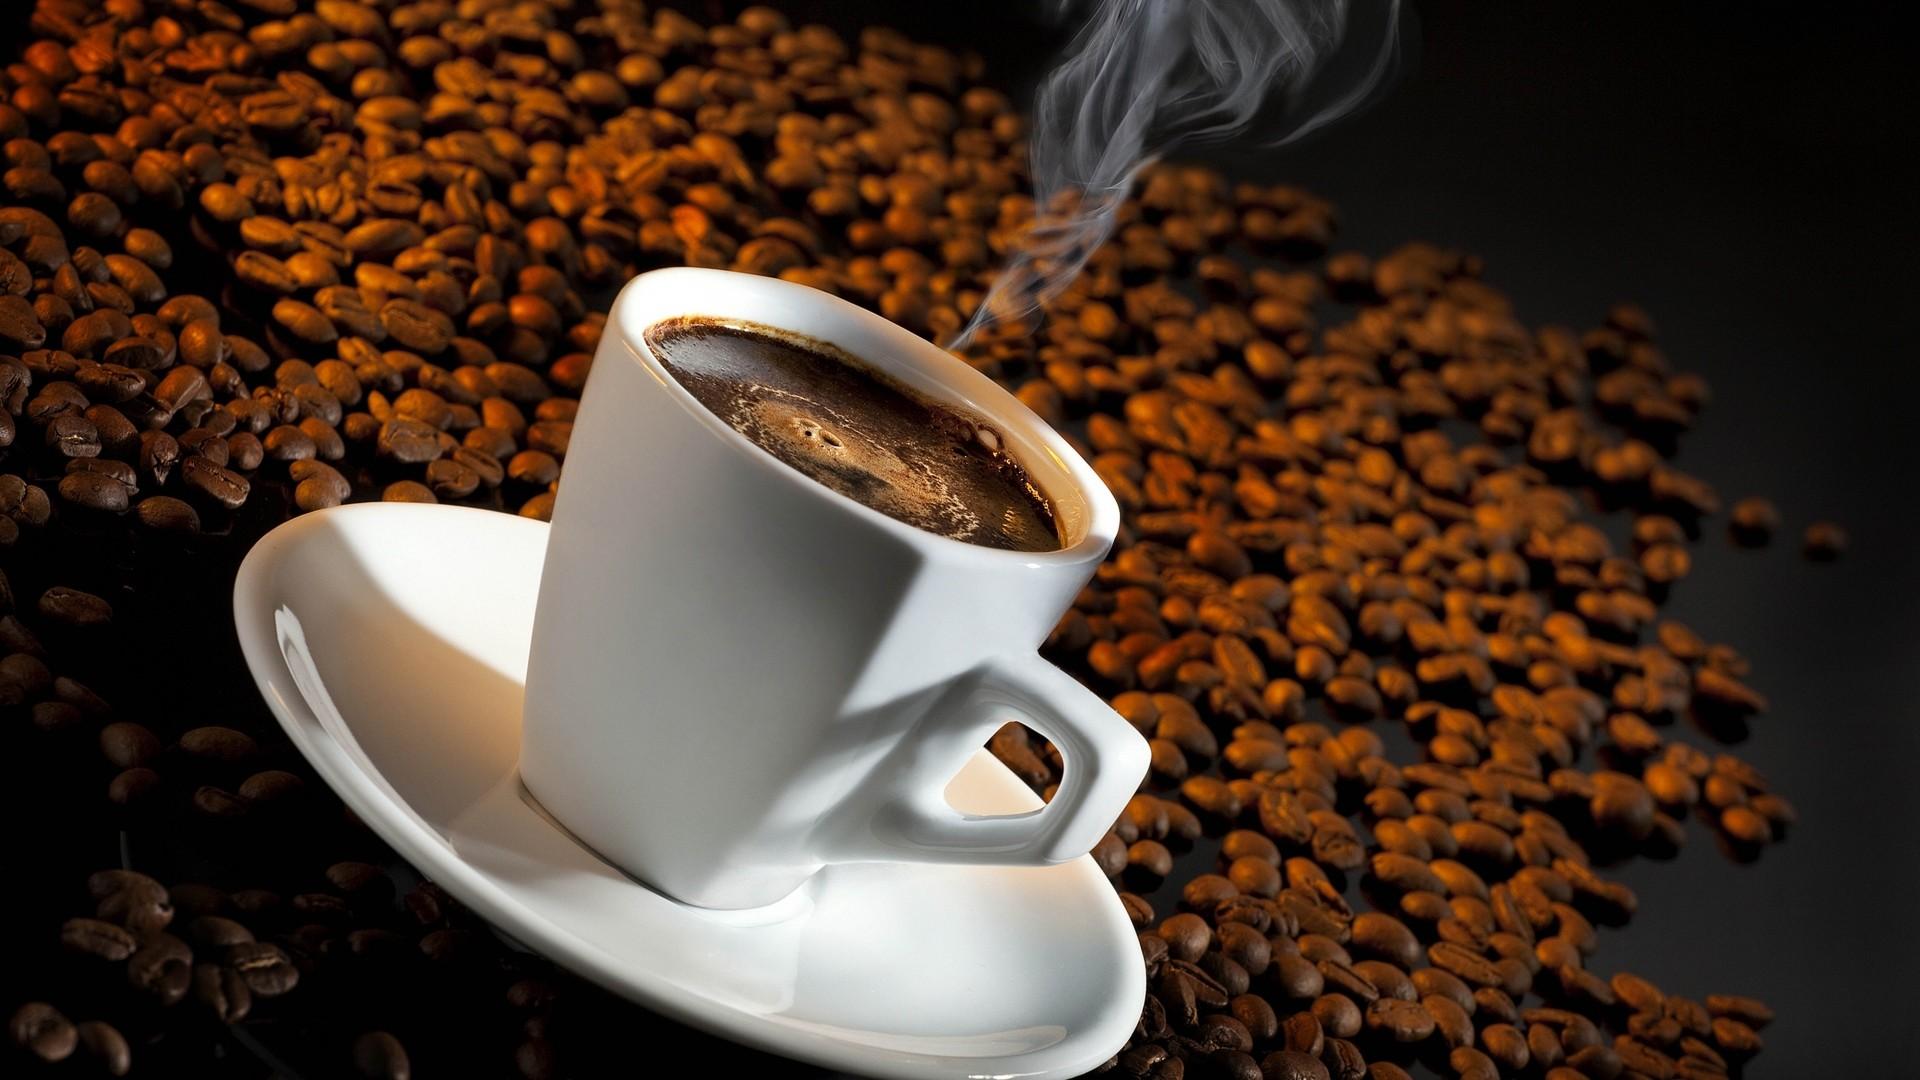 Wallpaper coffee, cup, steam, grain, saucer